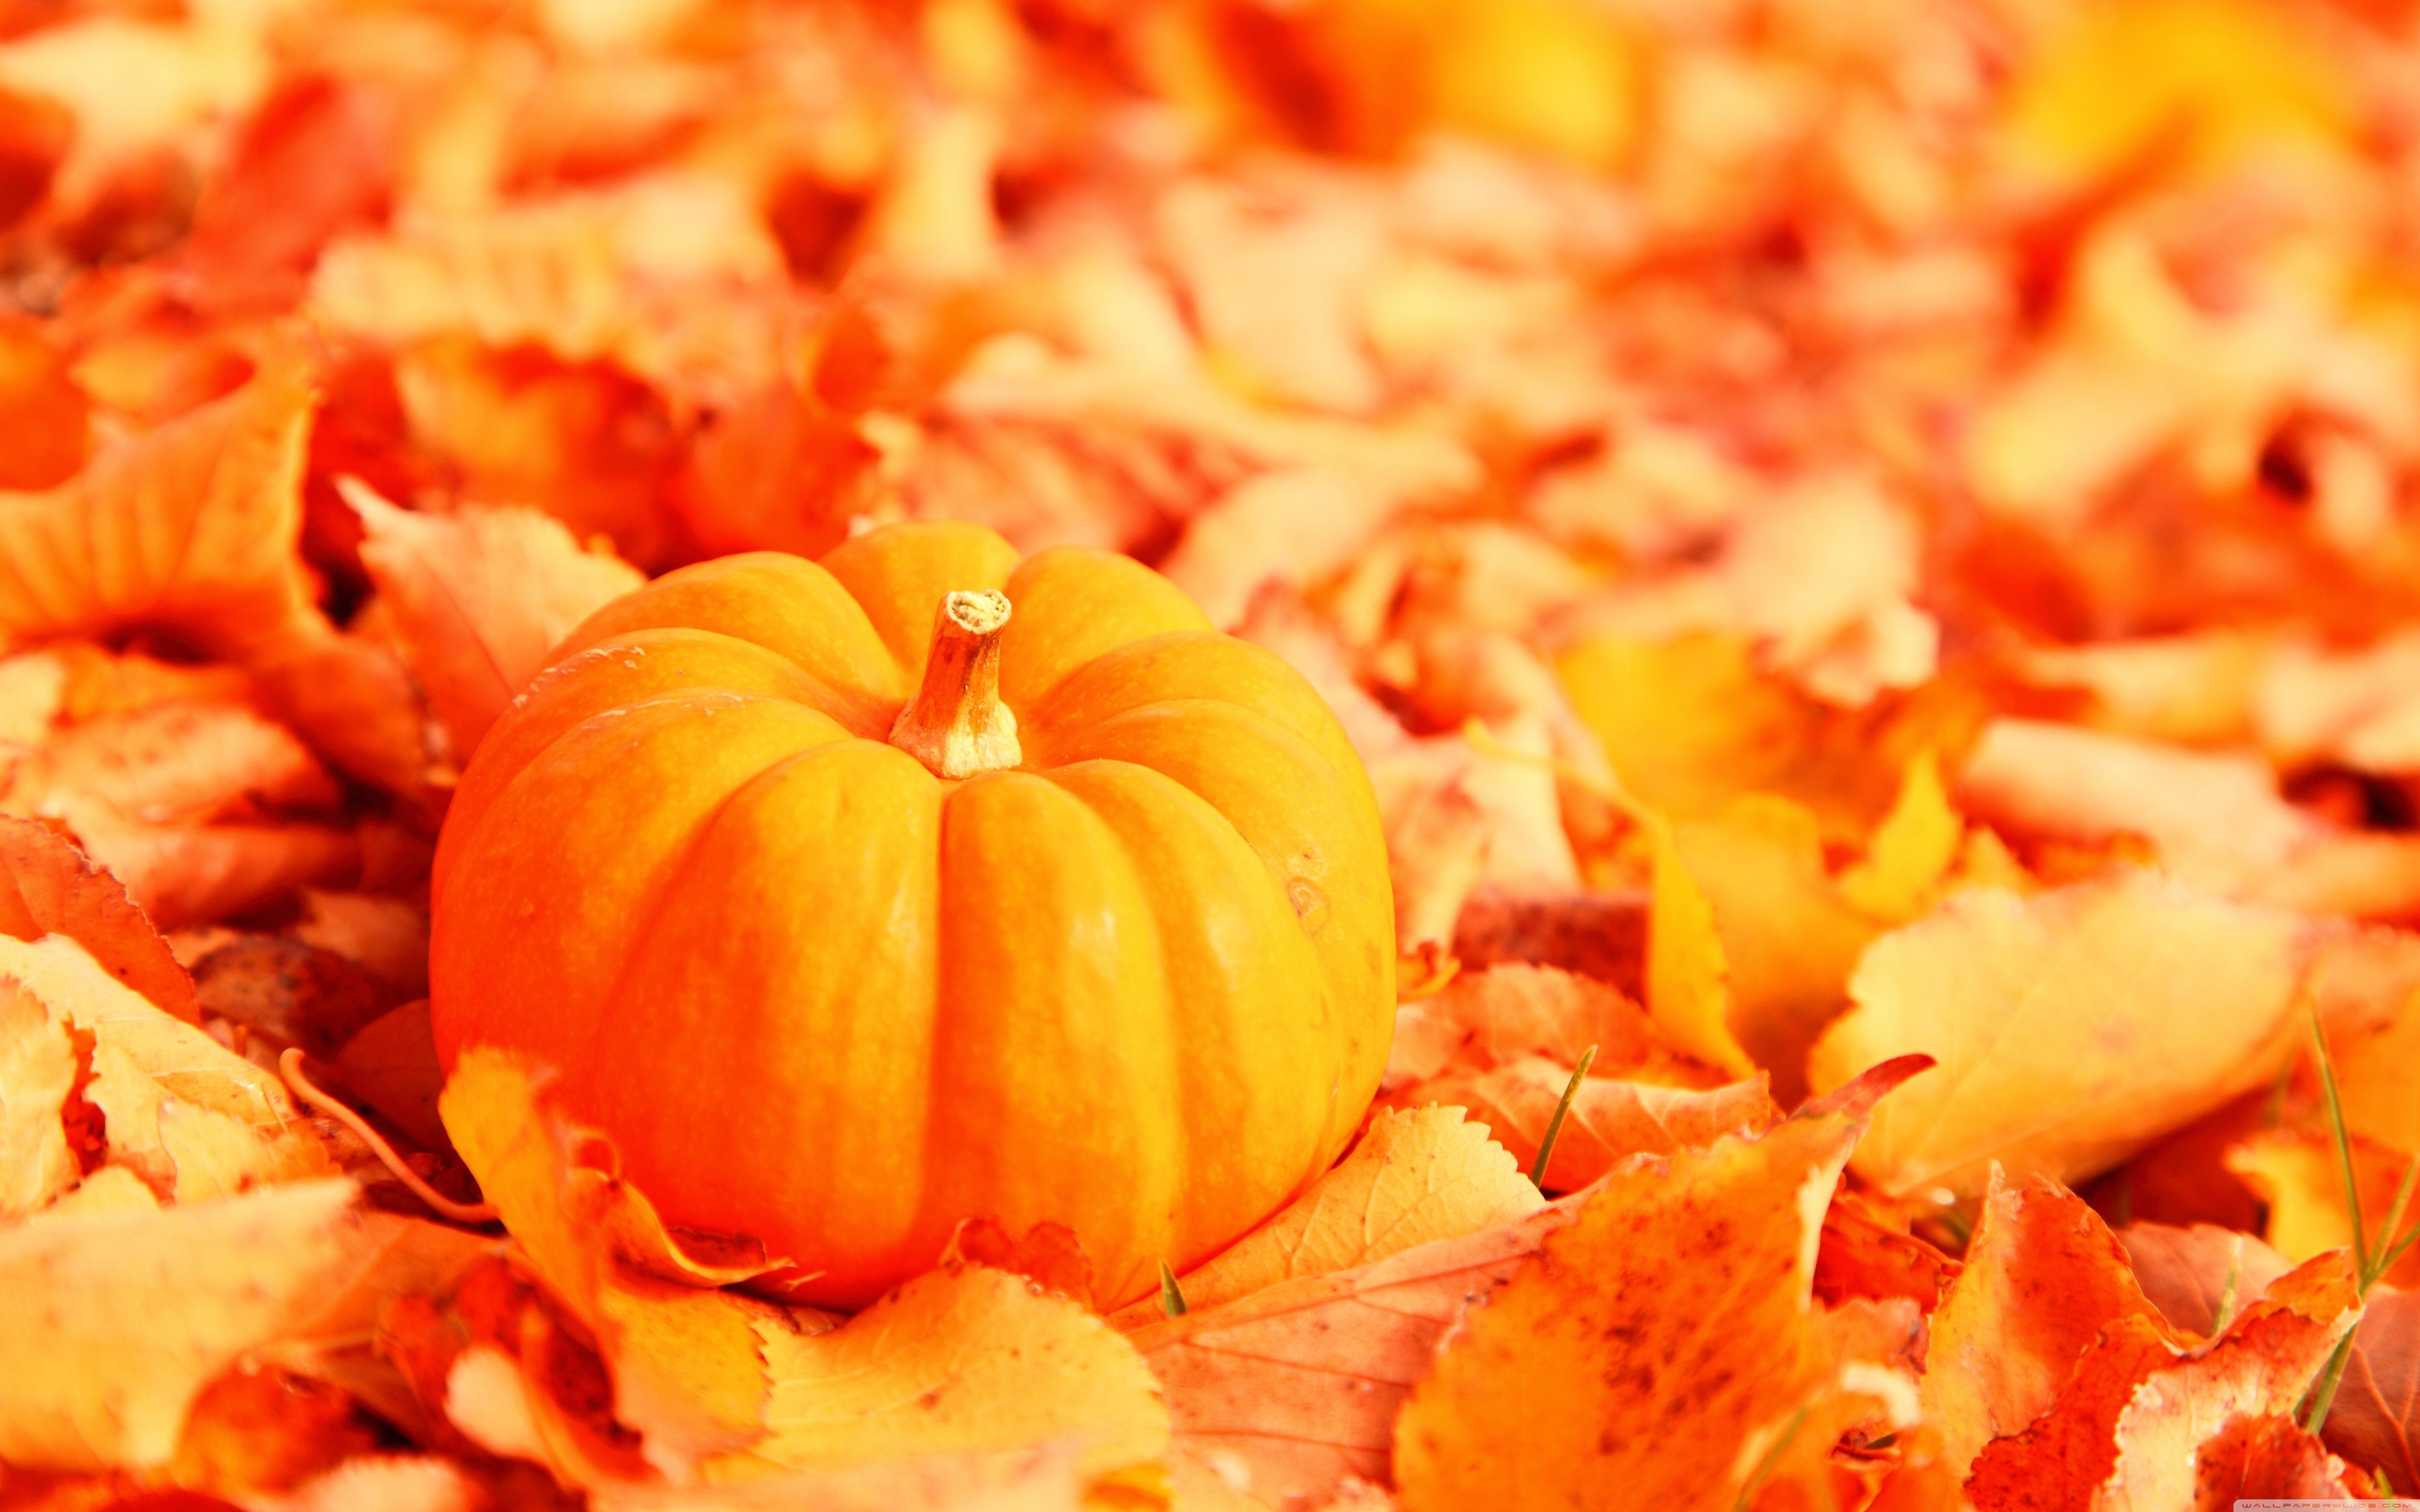 pumpkin and autumn leaves ❤ 4k hd desktop wallpaper for 4k ultra hd